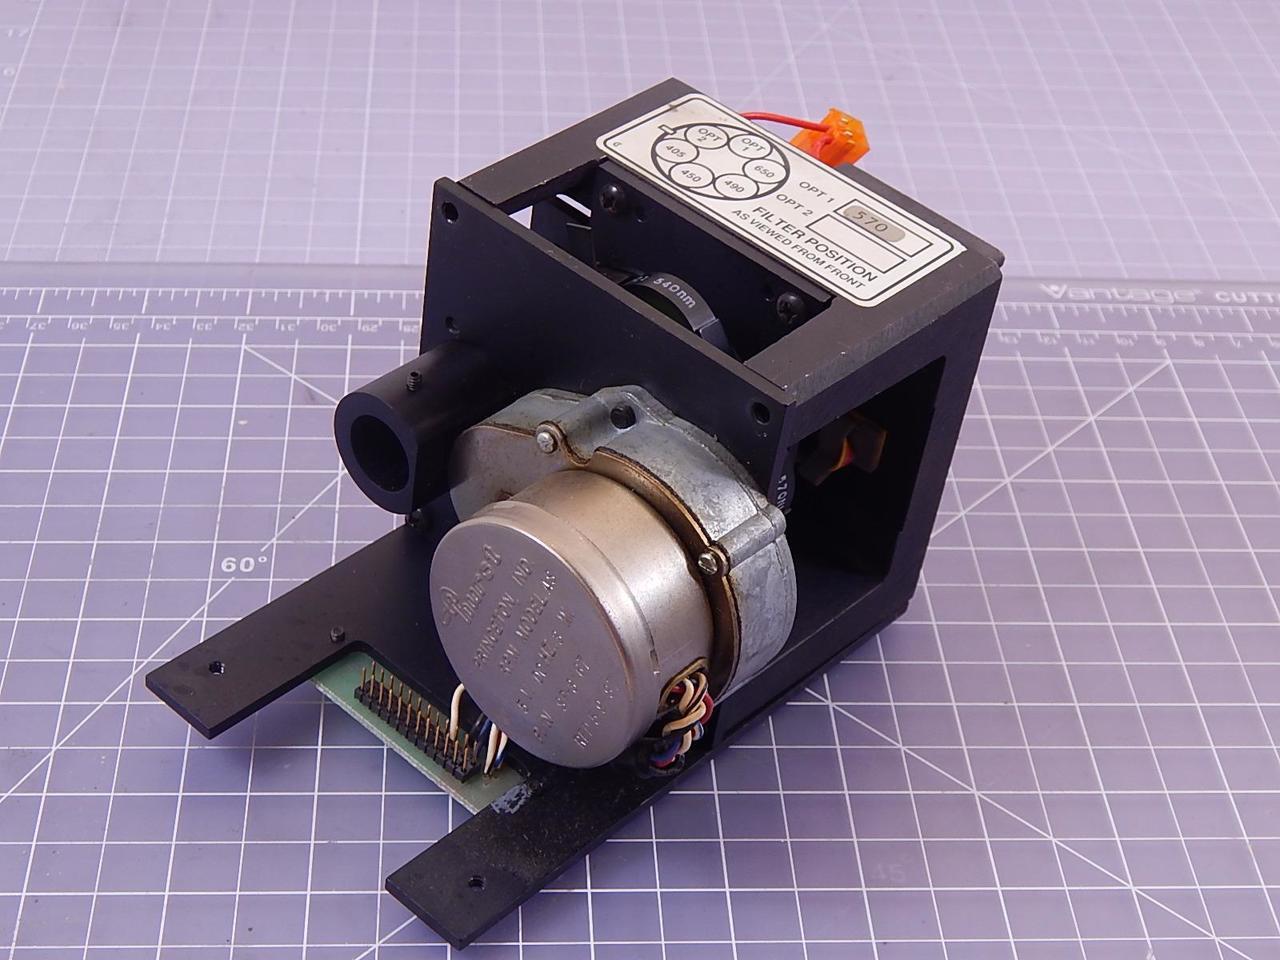 Hurst Sp 3167 Motor Assembly T98109 Test Equipment And